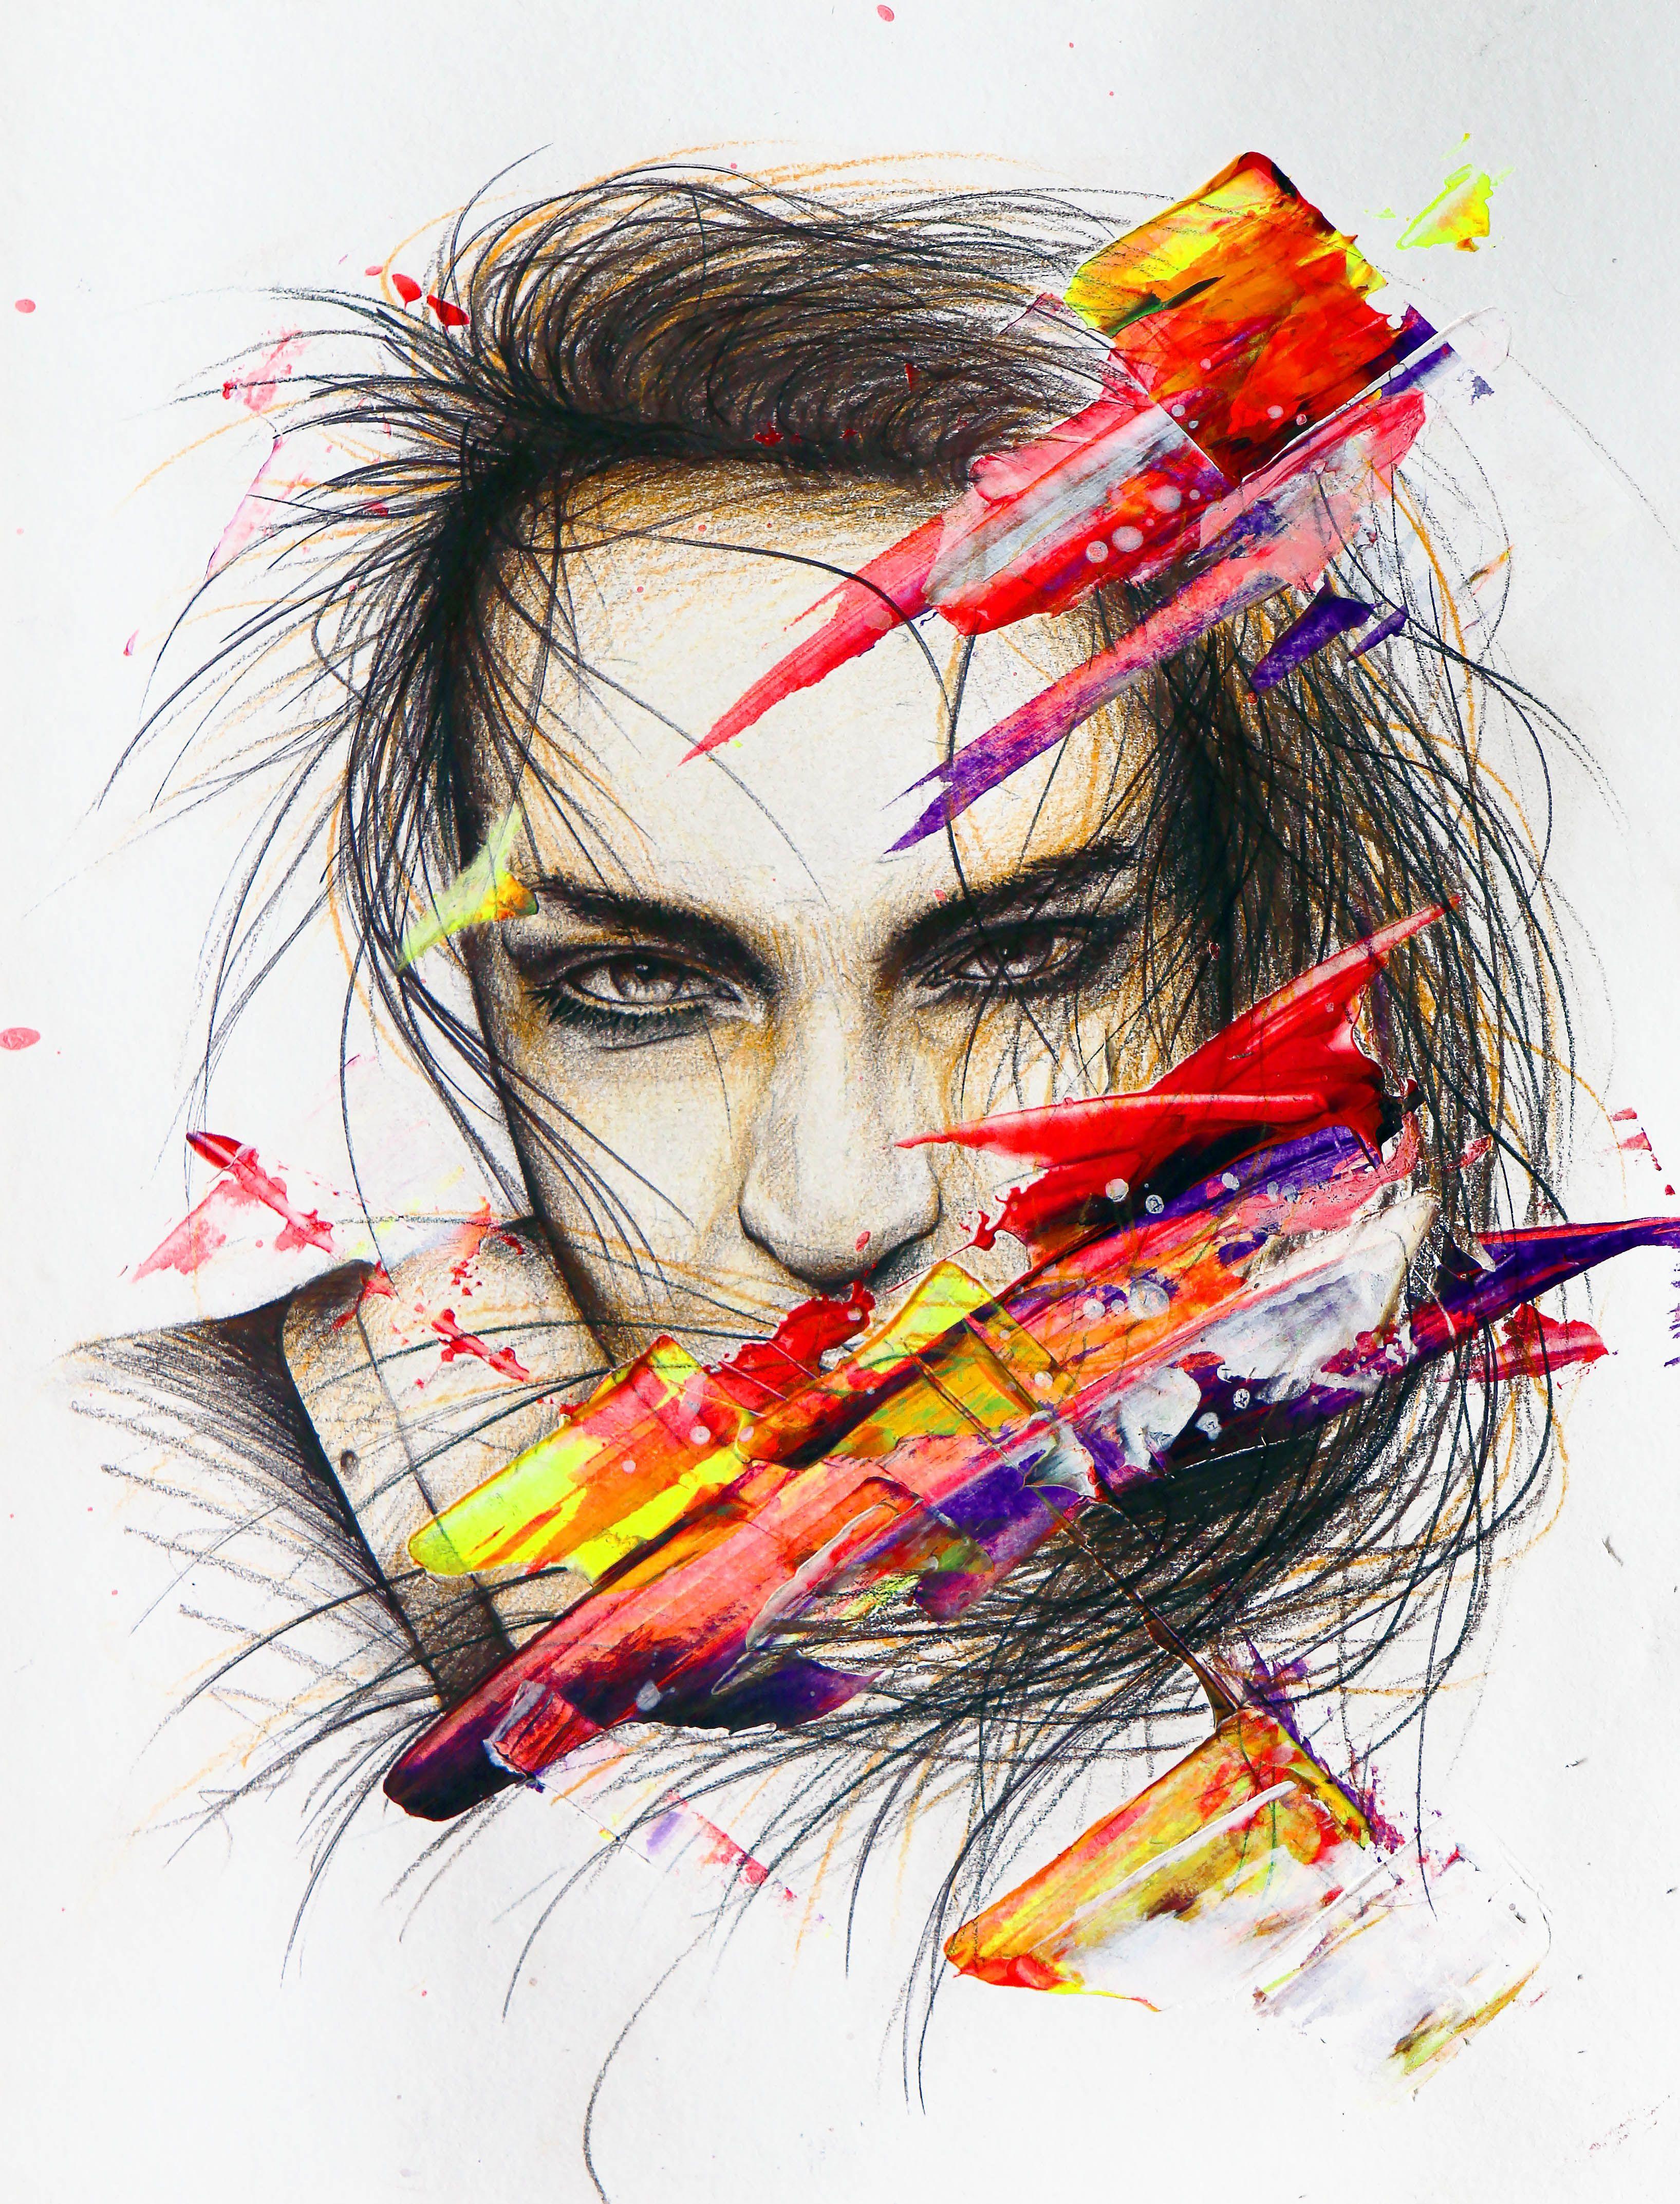 "Brutalié / Collection ""Apparences"" / 24 x 32 cm / Modèle : #sabinefischer / #portrait #art #sketch #fredml #ink #dark #flash #ink #acrilyque #fluo #trash #yellow #red #black #purple #brown"